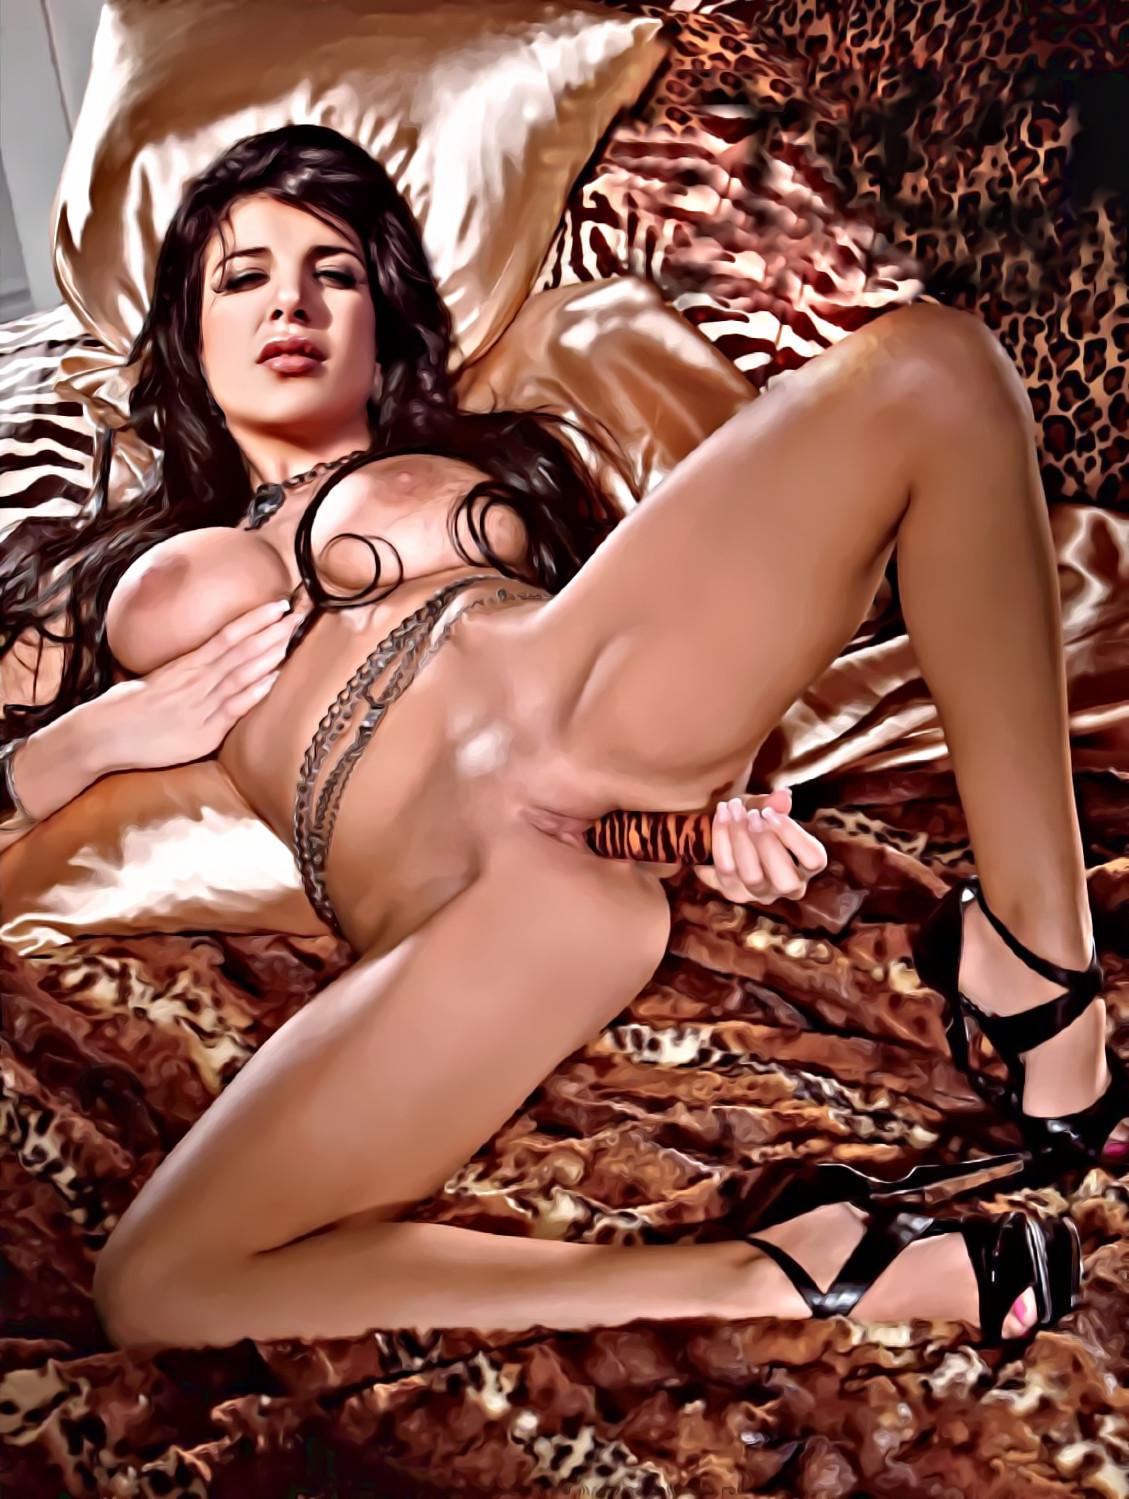 Andrea Rincon Xxx showing porn images for andrea rincon photos sex porn | www